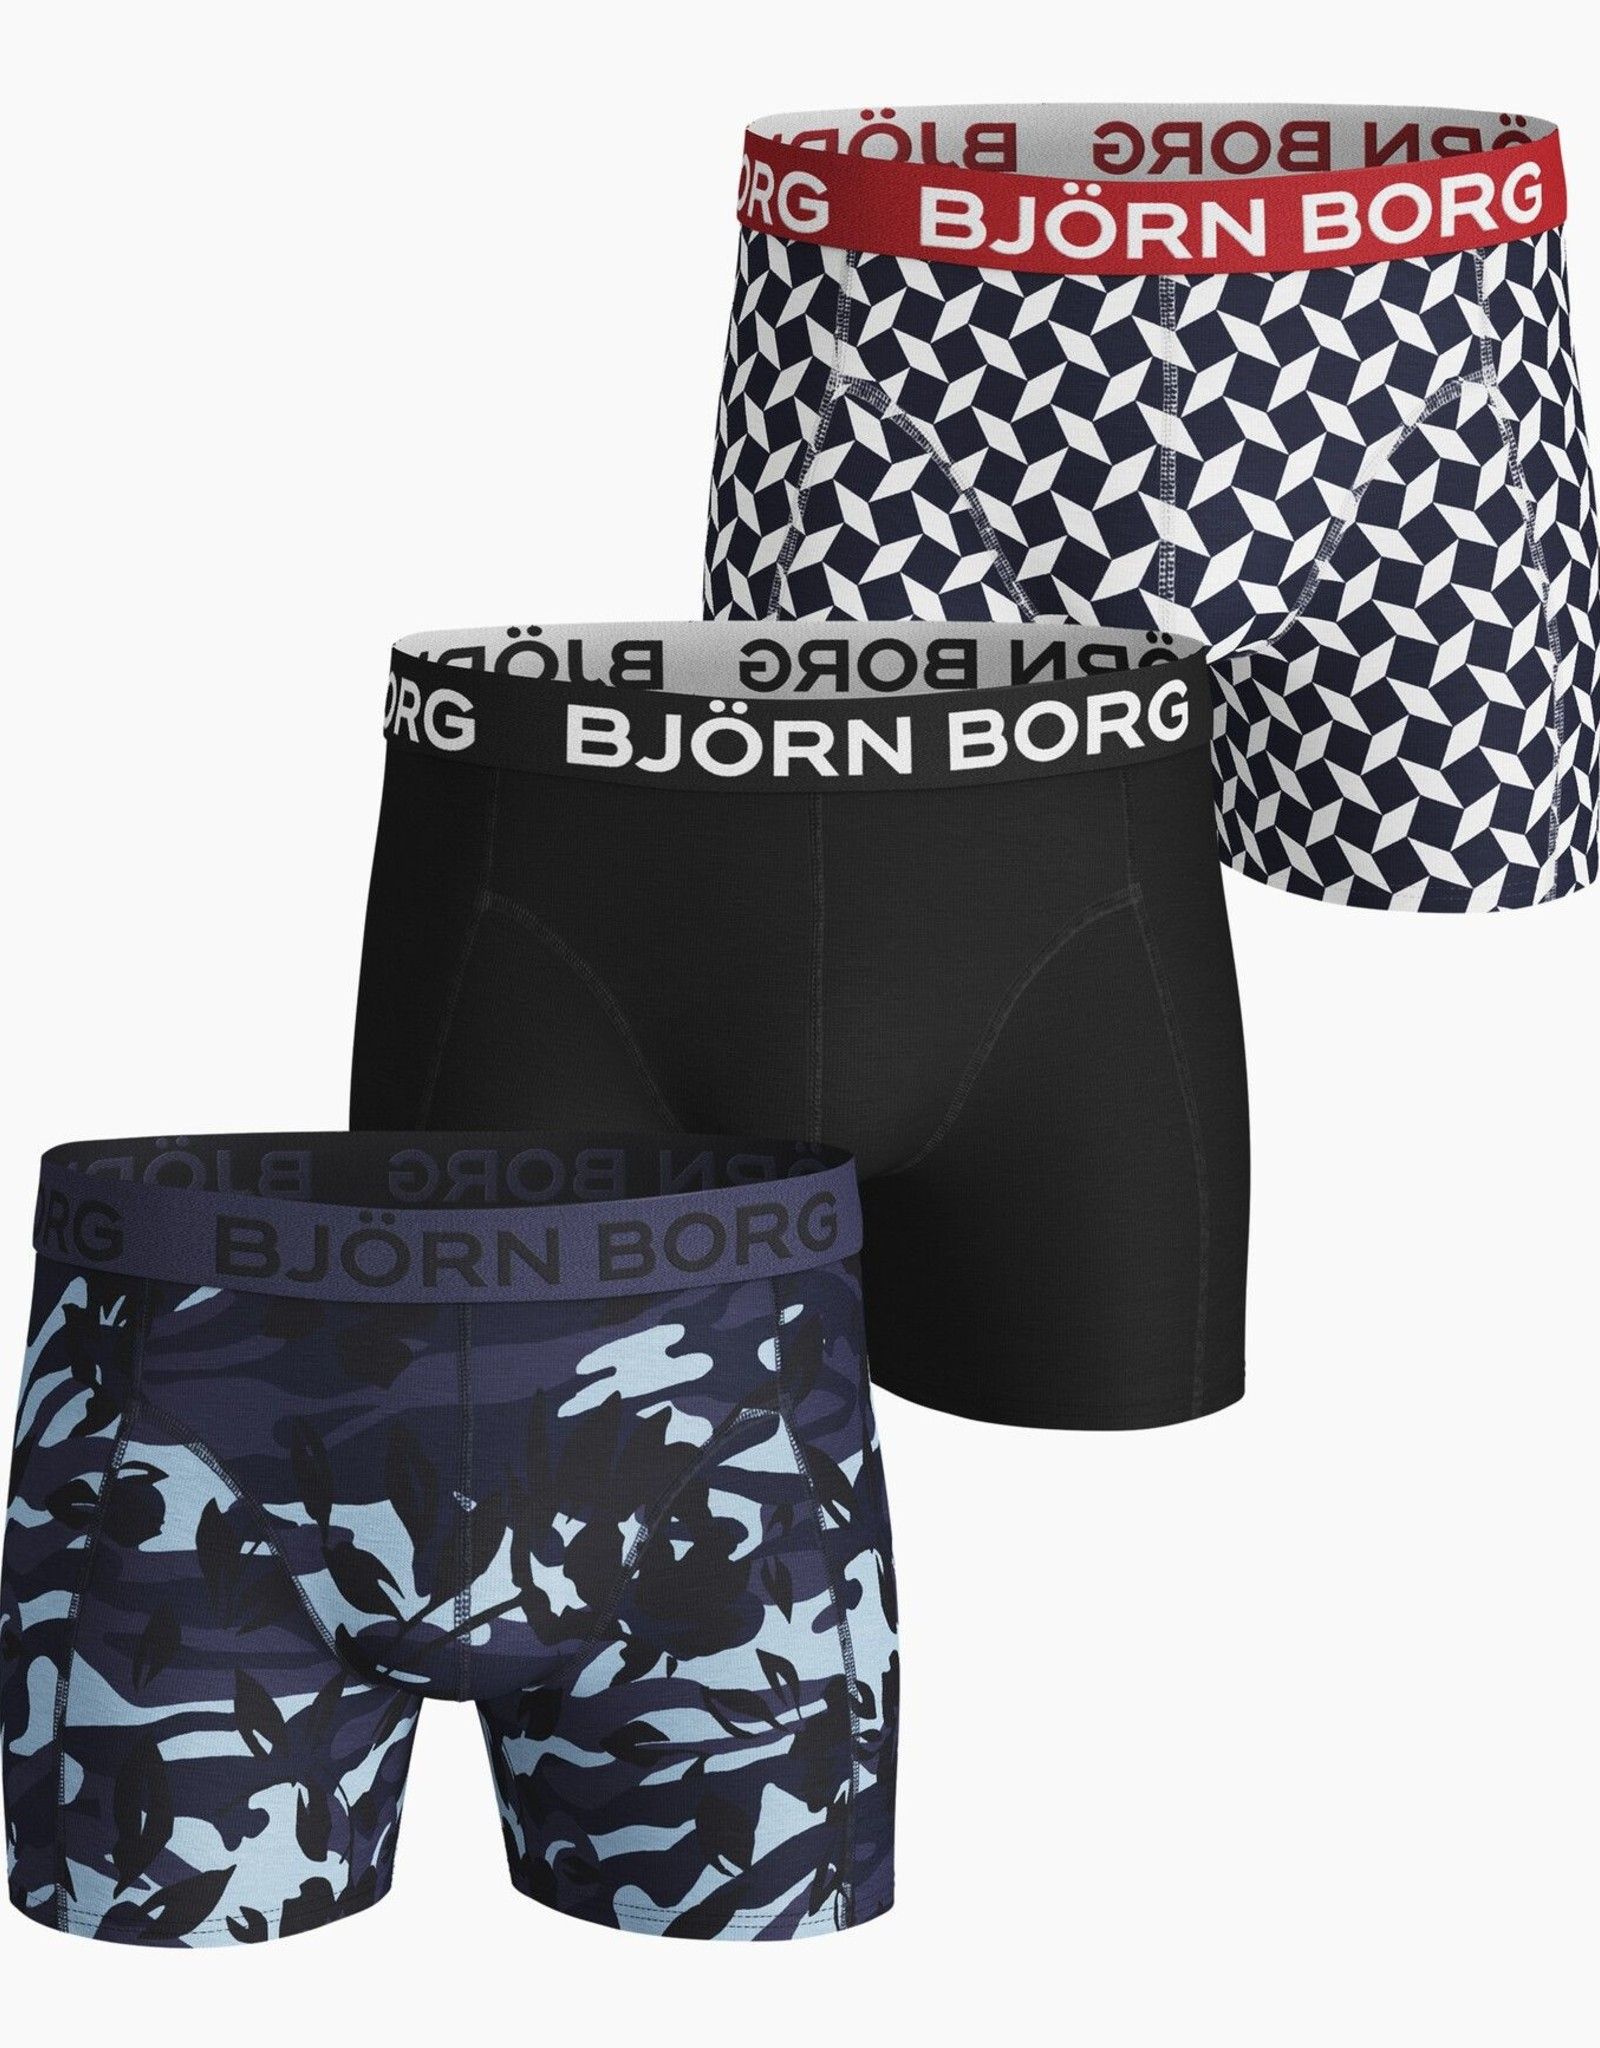 Bjorn Borg Boxershorts 3 Pack Camo Floral